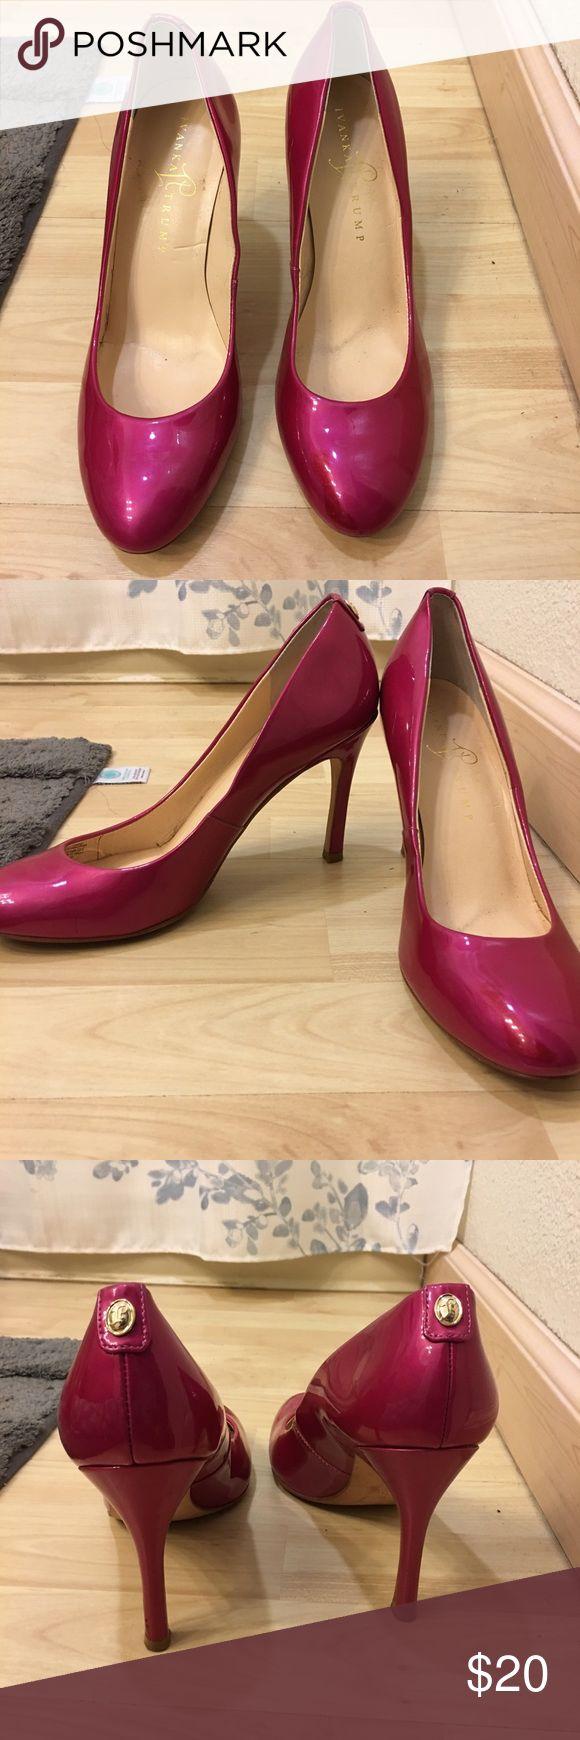 Best 25 Hot Pink Heels Ideas On Pinterest Bright Pink